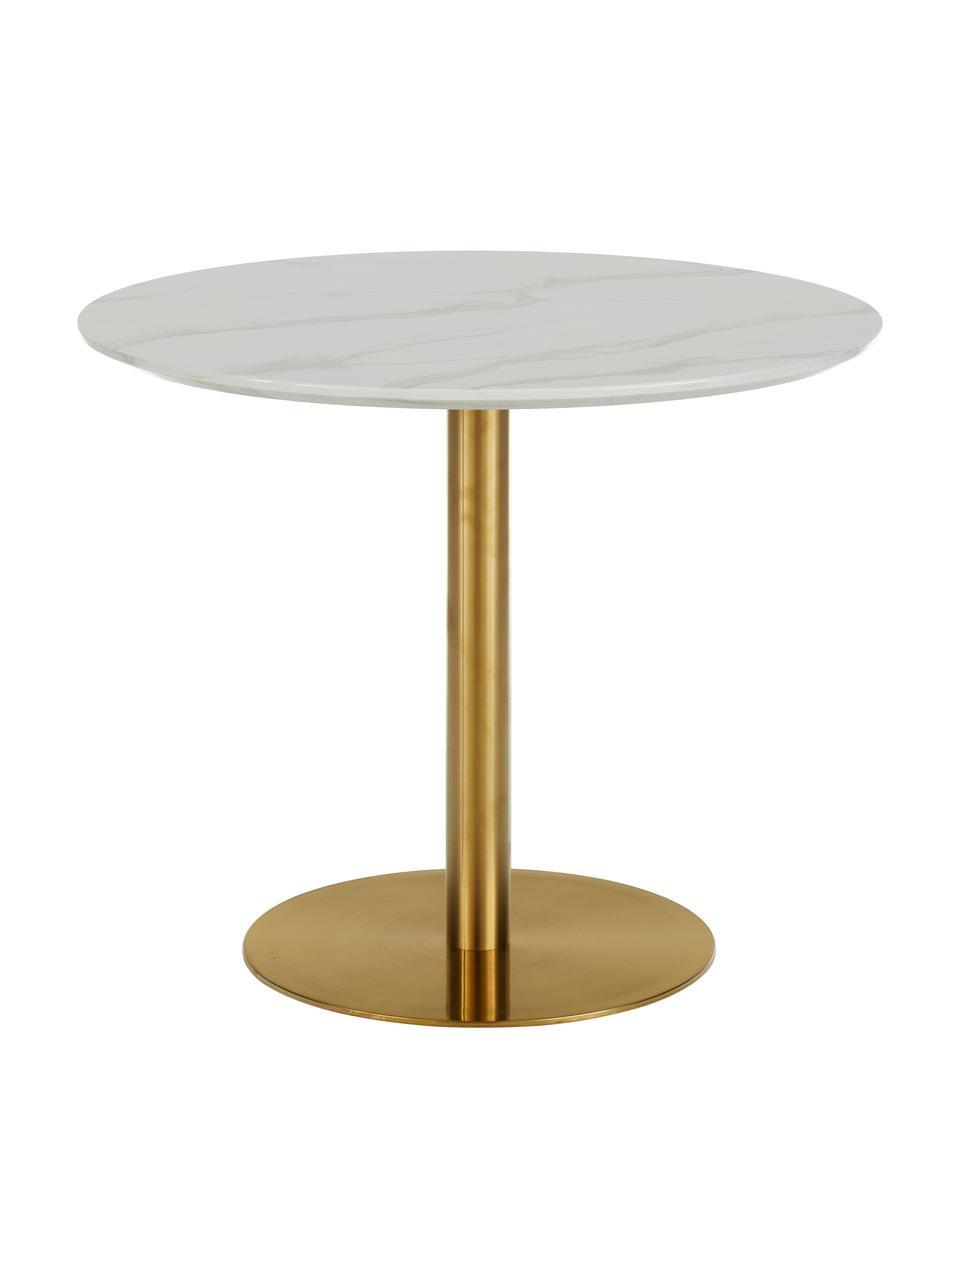 Tavolo rotondo effetto marmo bianco/dorato Karla, Ø 90 cm, Bianco con  effetto marmo, Ø 90 x Alt. 75 cm